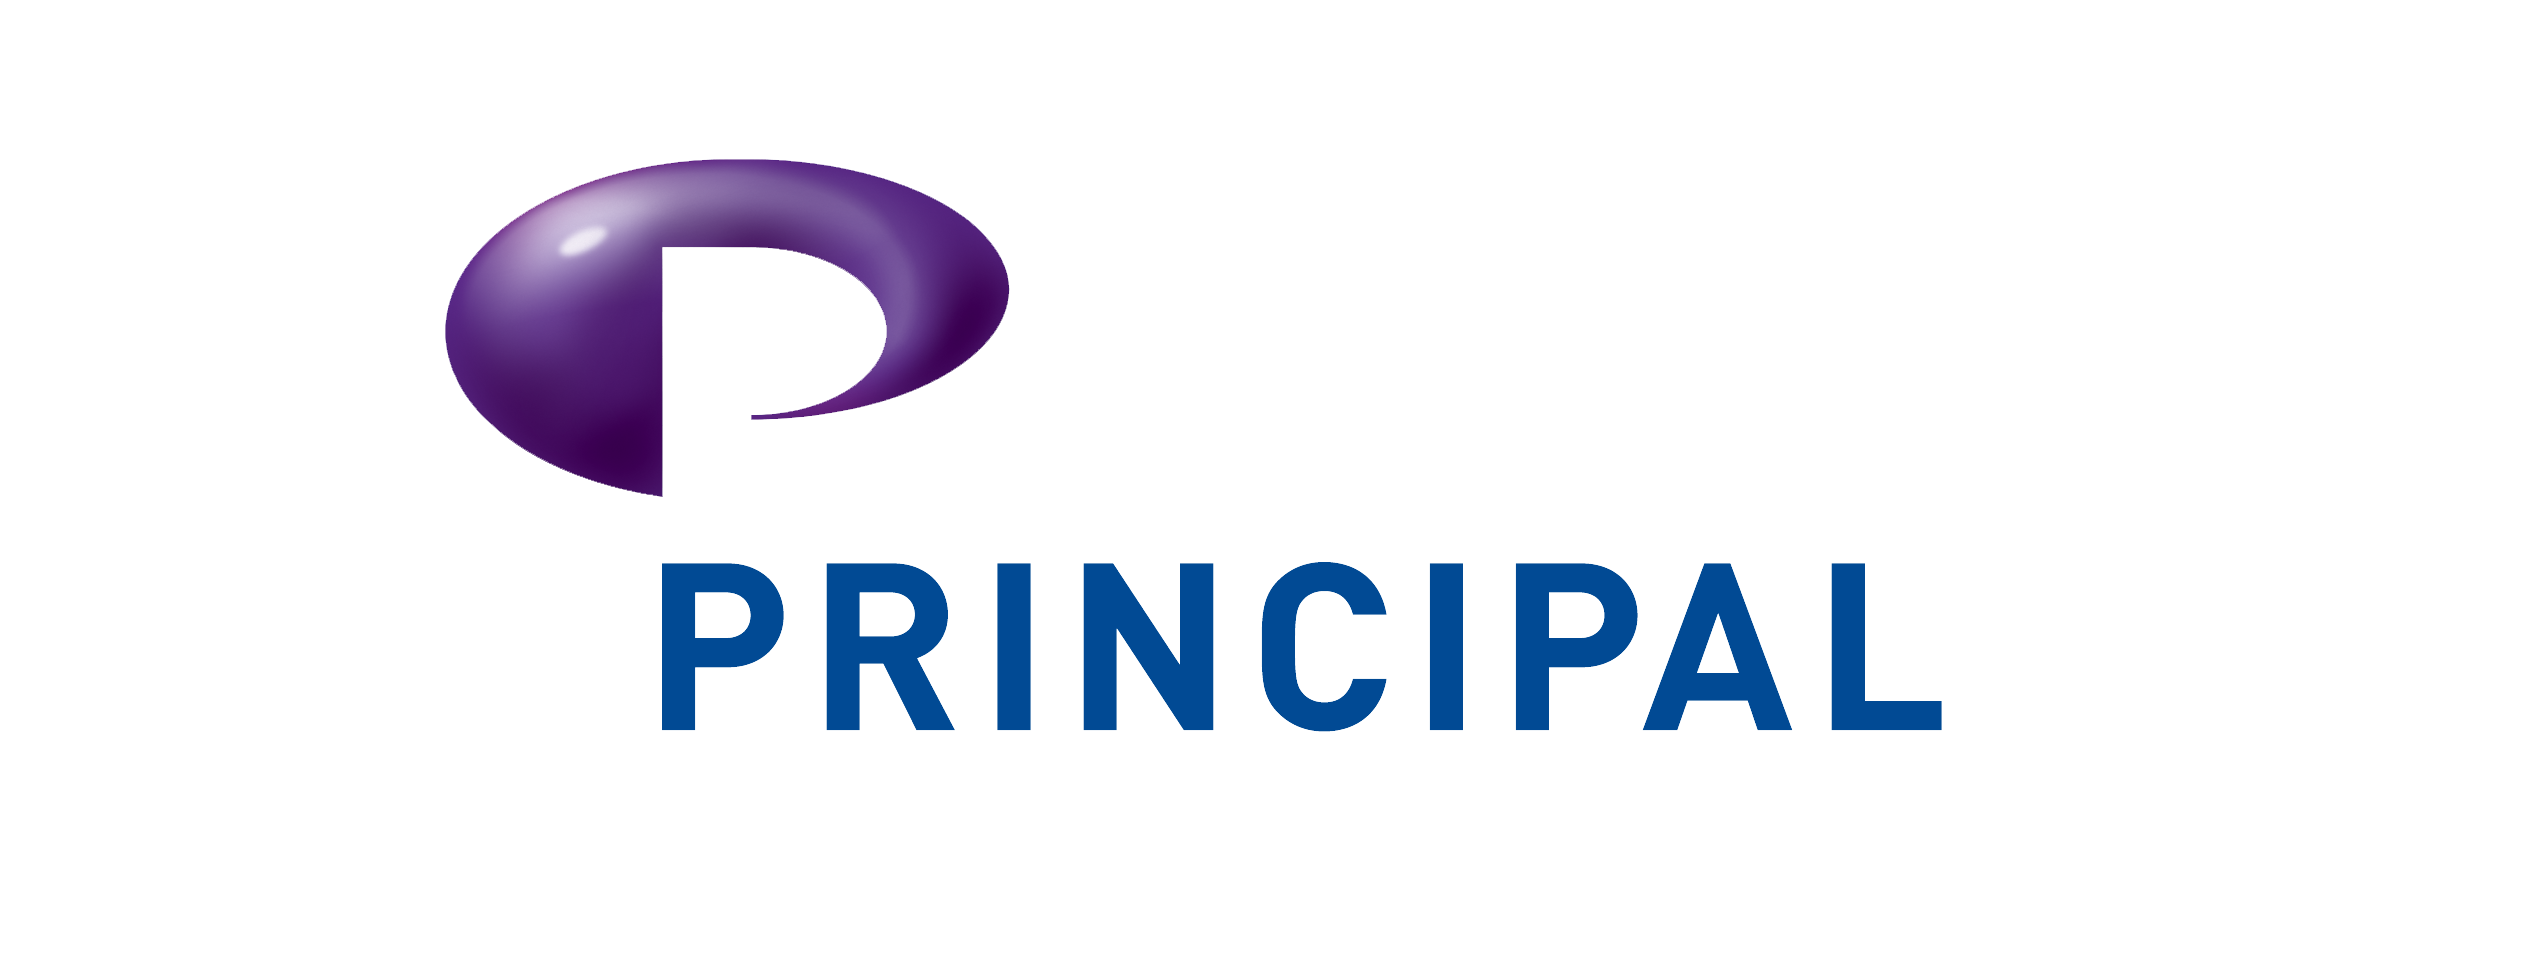 2_principal_logo_2528